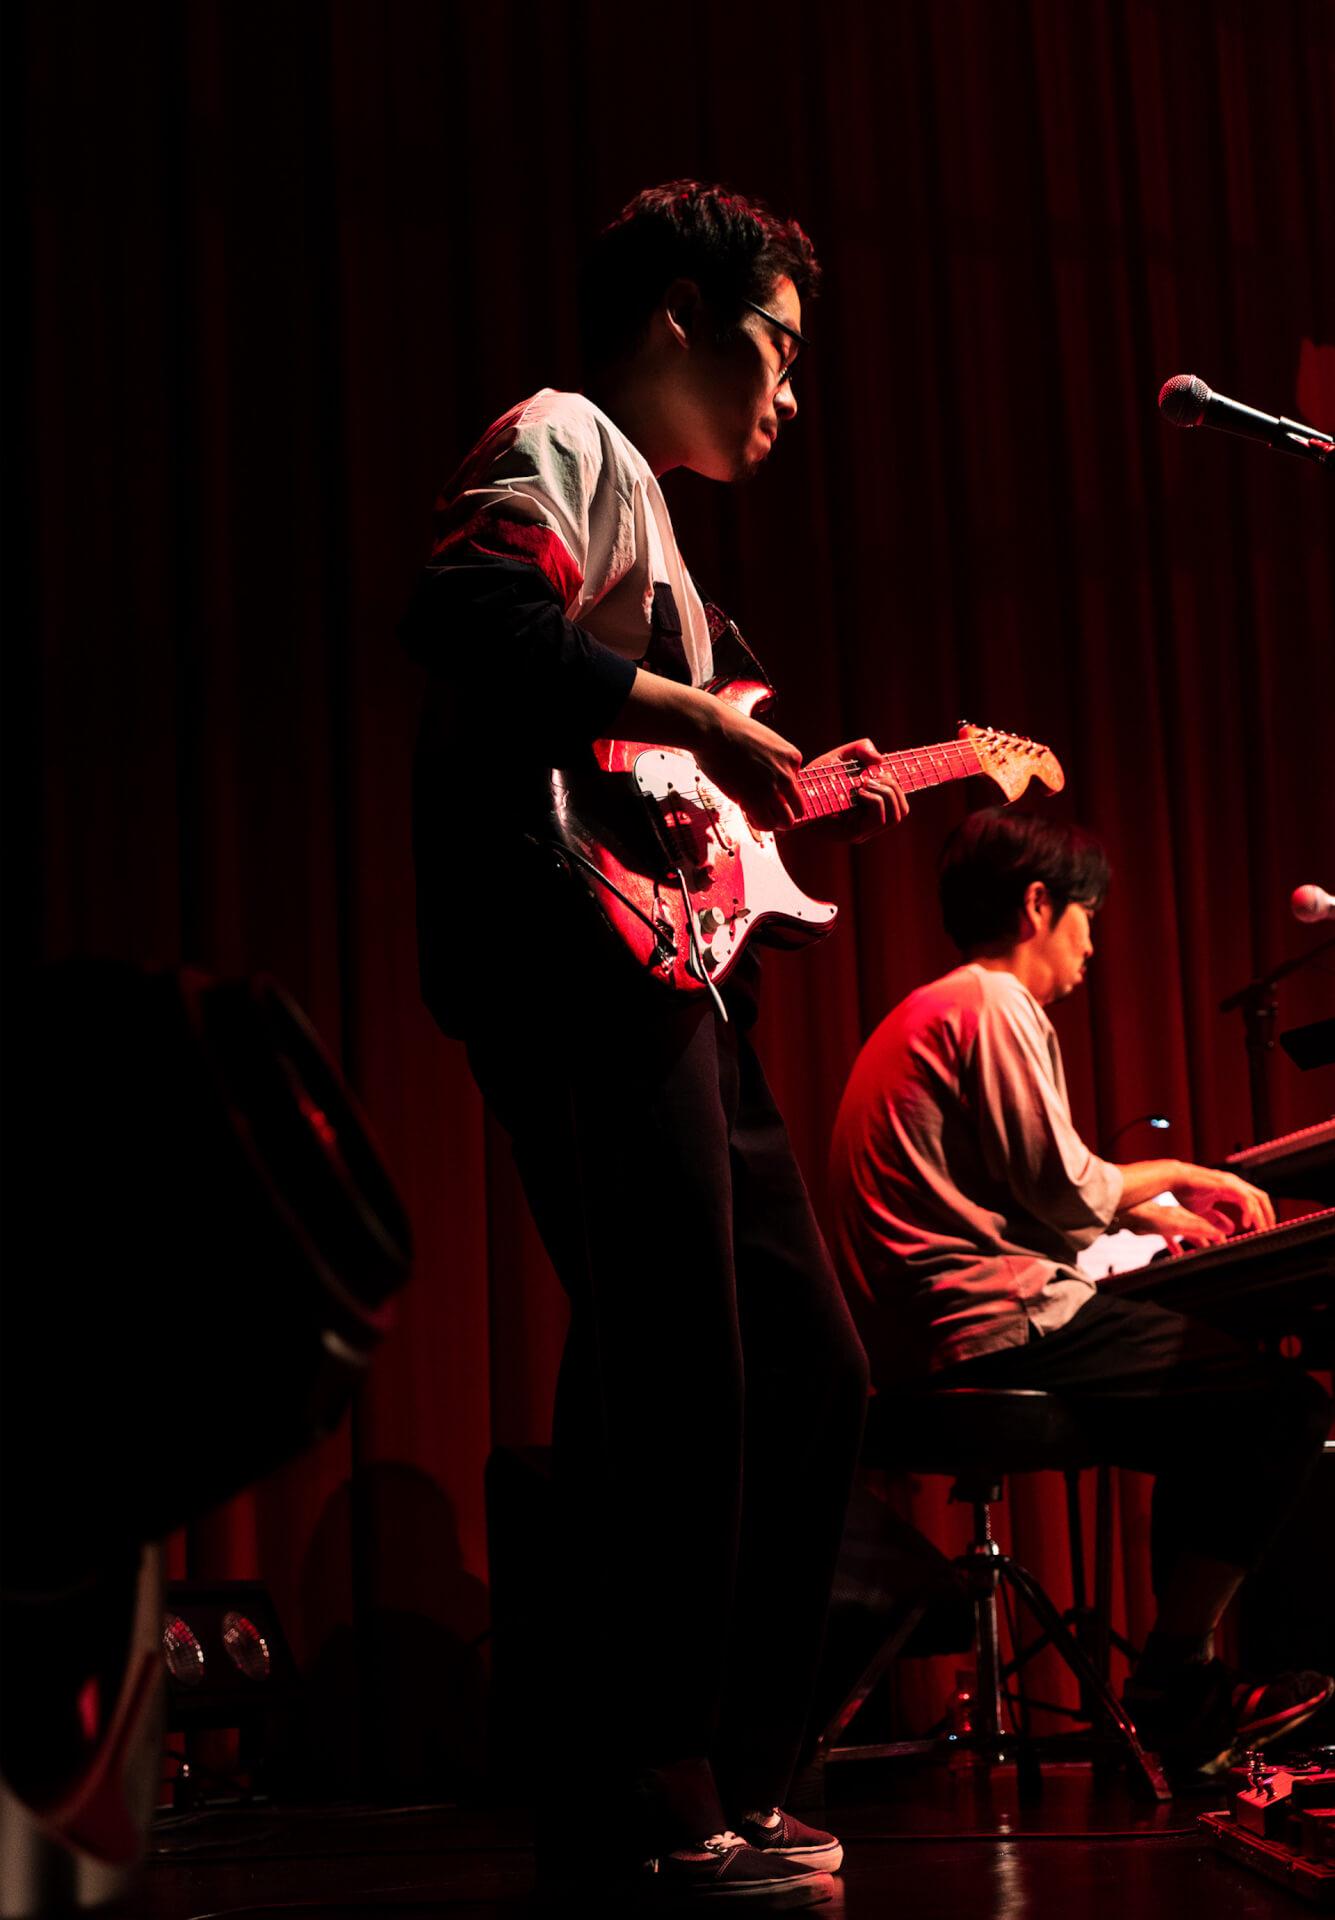 BIM初のビルボードライブ公演のライブレポートが到着!バンドセットでPUNPEE、kZm、STUTSらと共演 music201112_bim_live_4